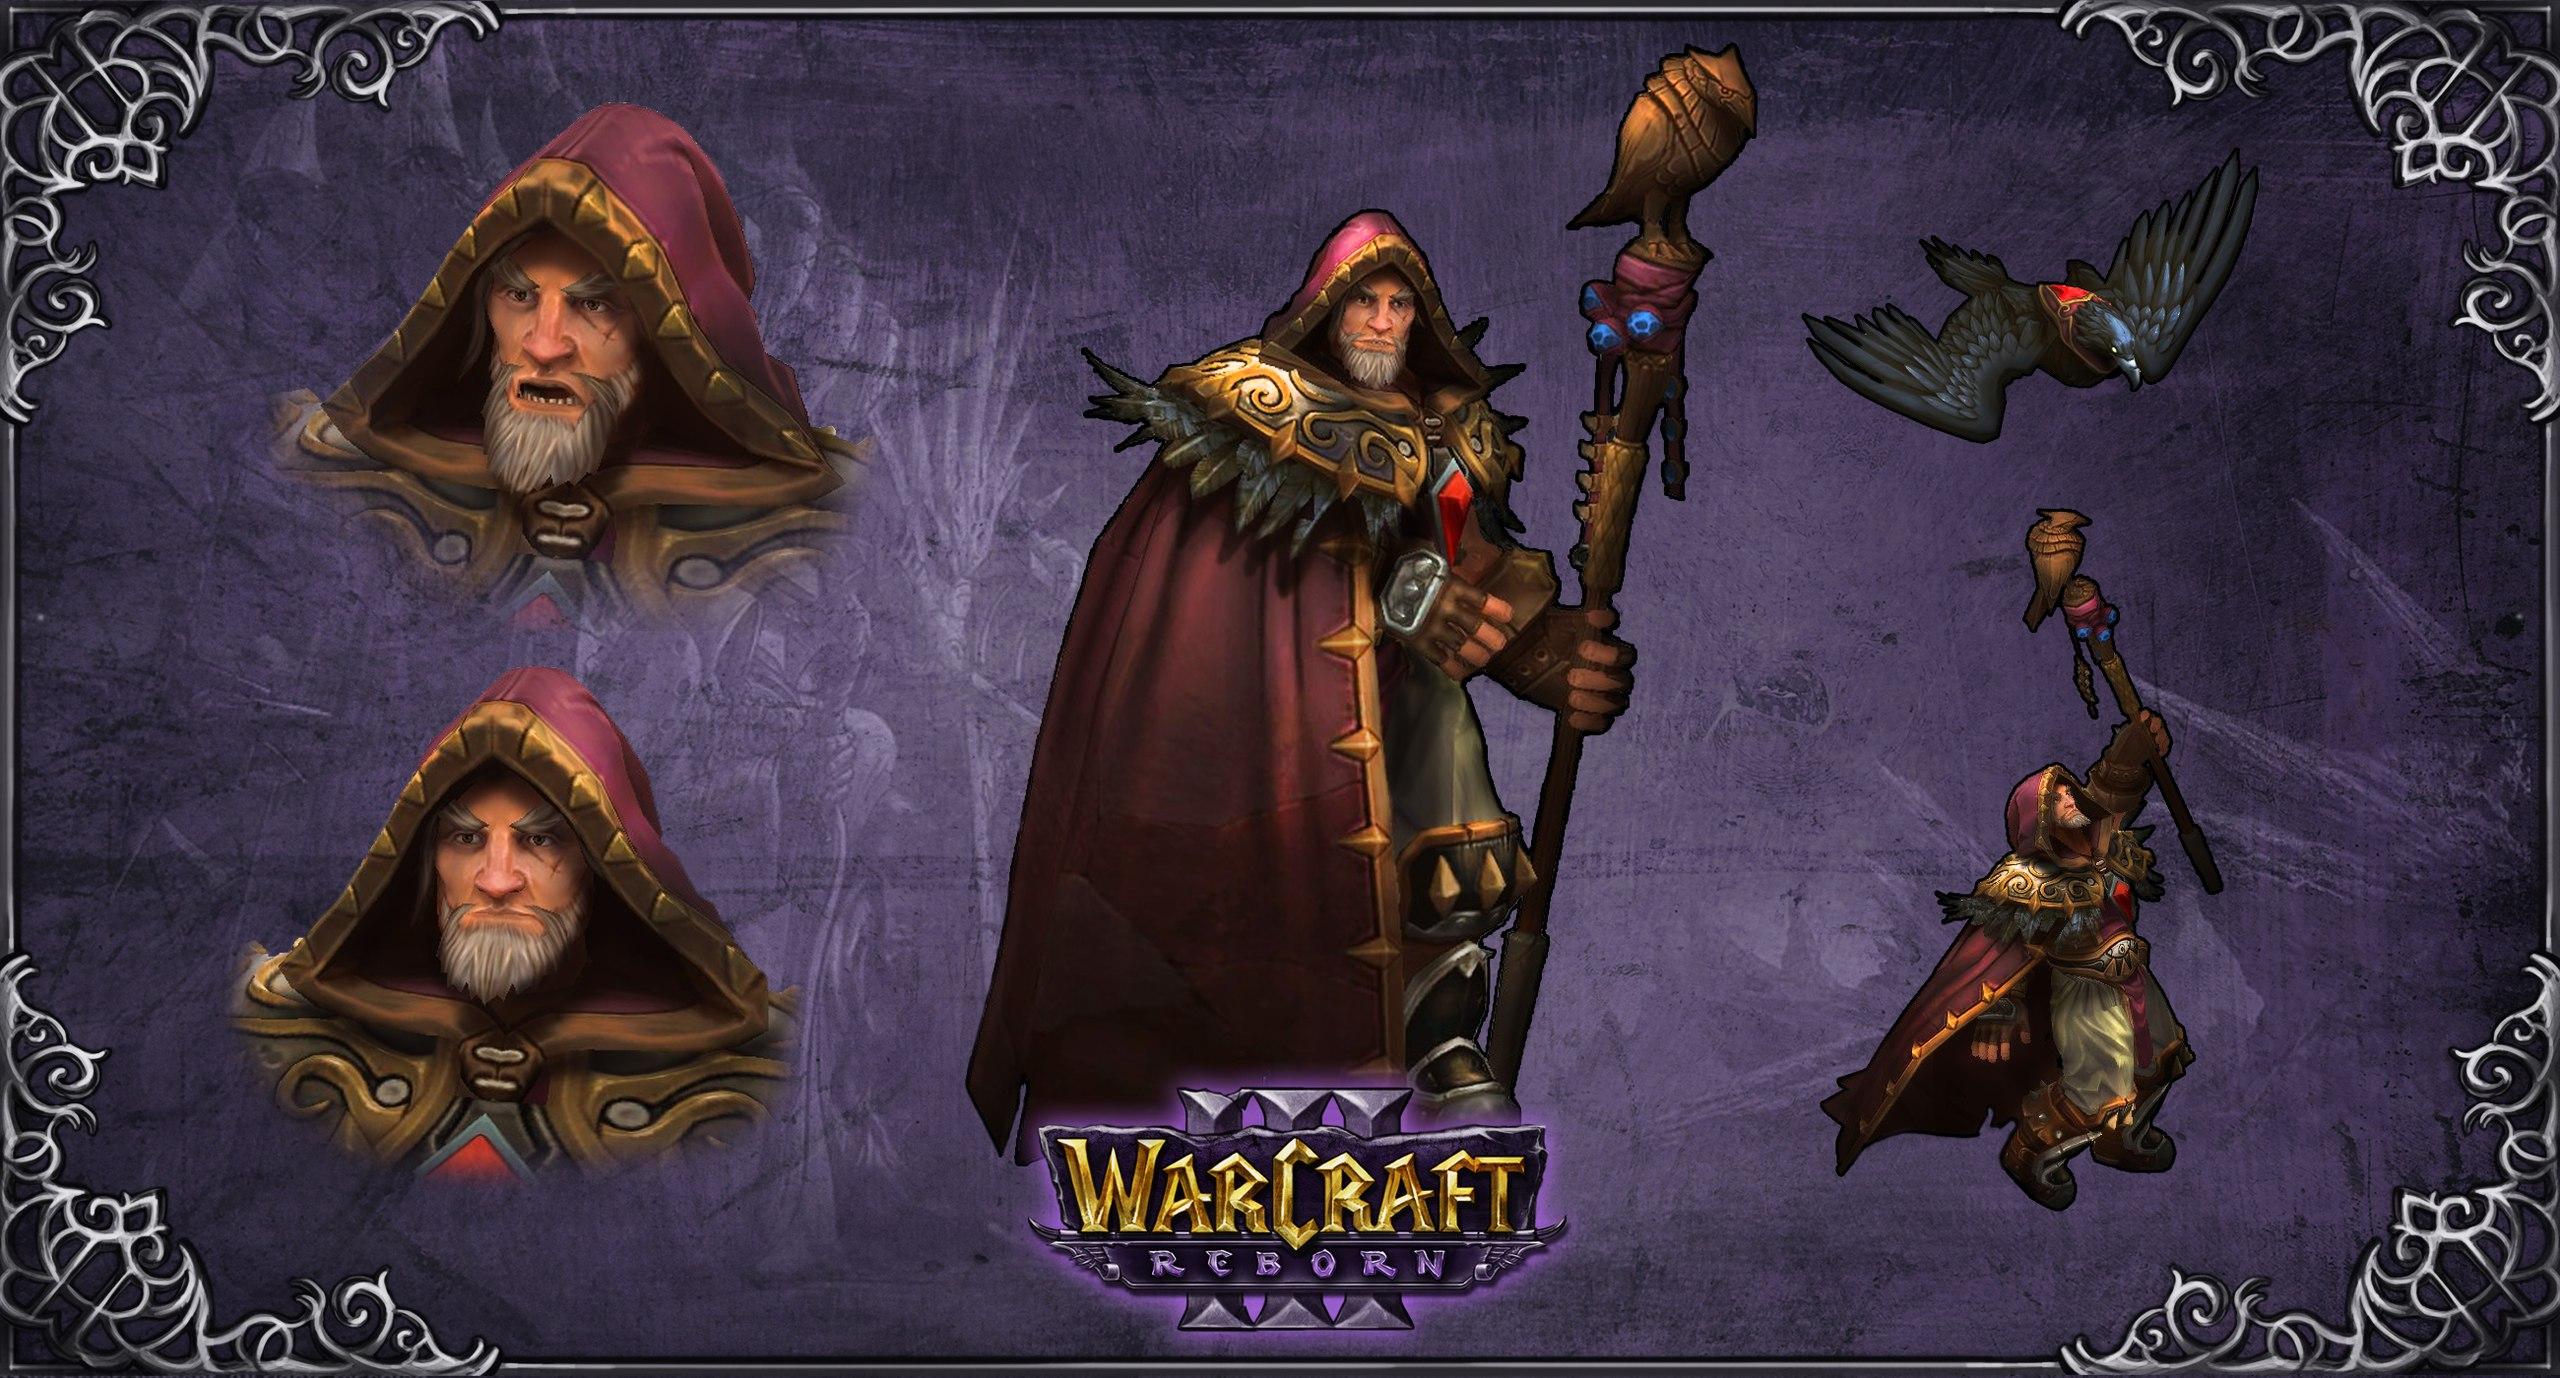 Medivh image - Warcraft 3 - Reborn mod for Warcraft III ...